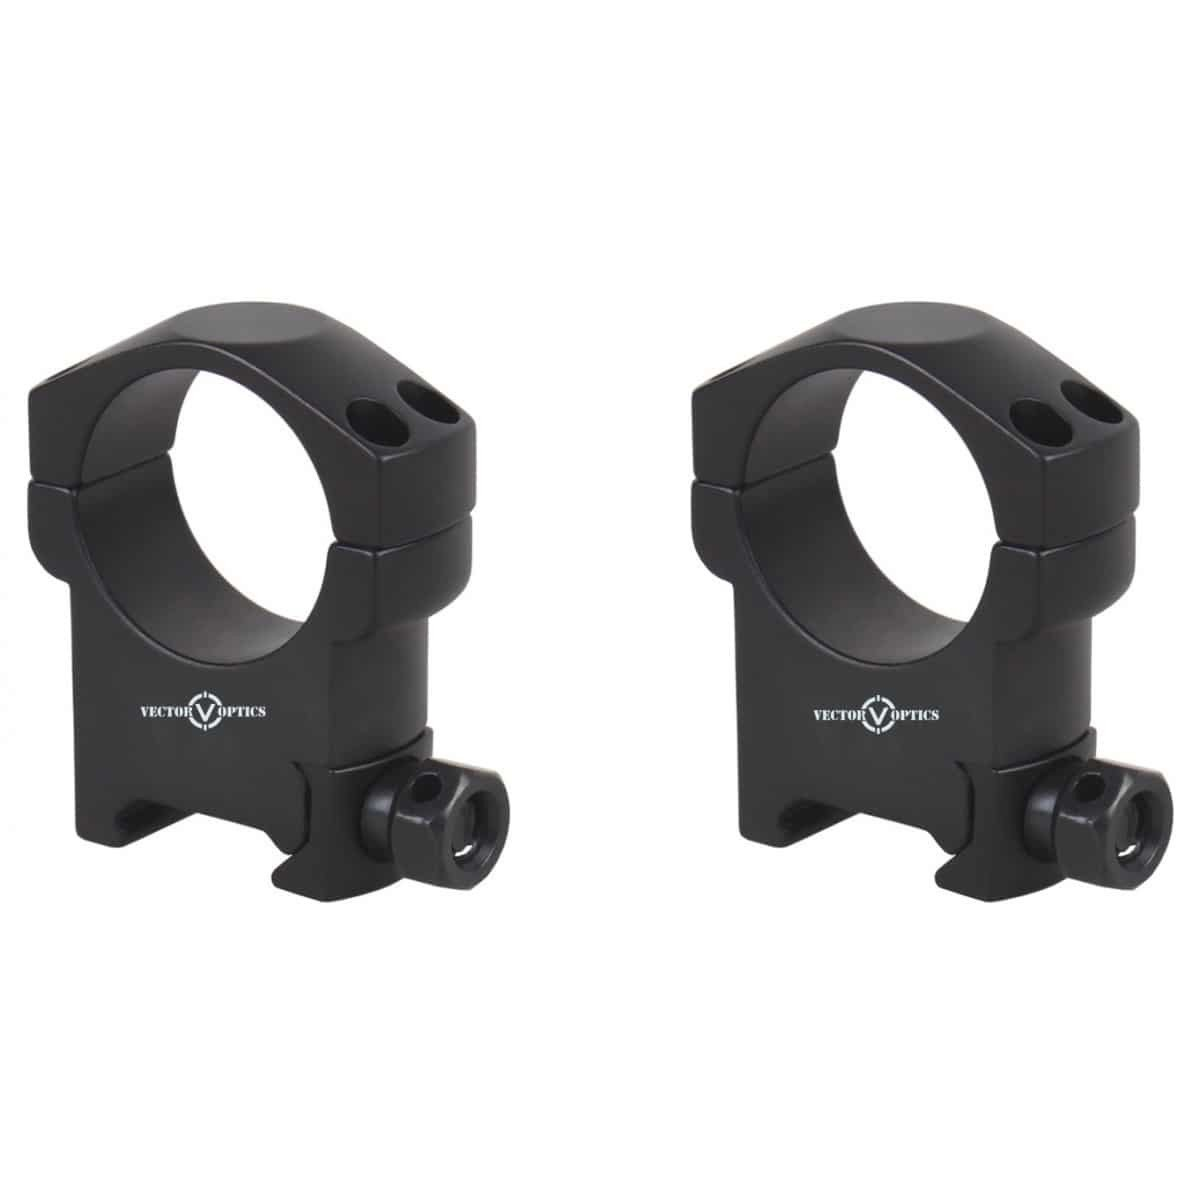 Vector Optics 30mm High Mark Weaver Mount Rings(SCTM-08)